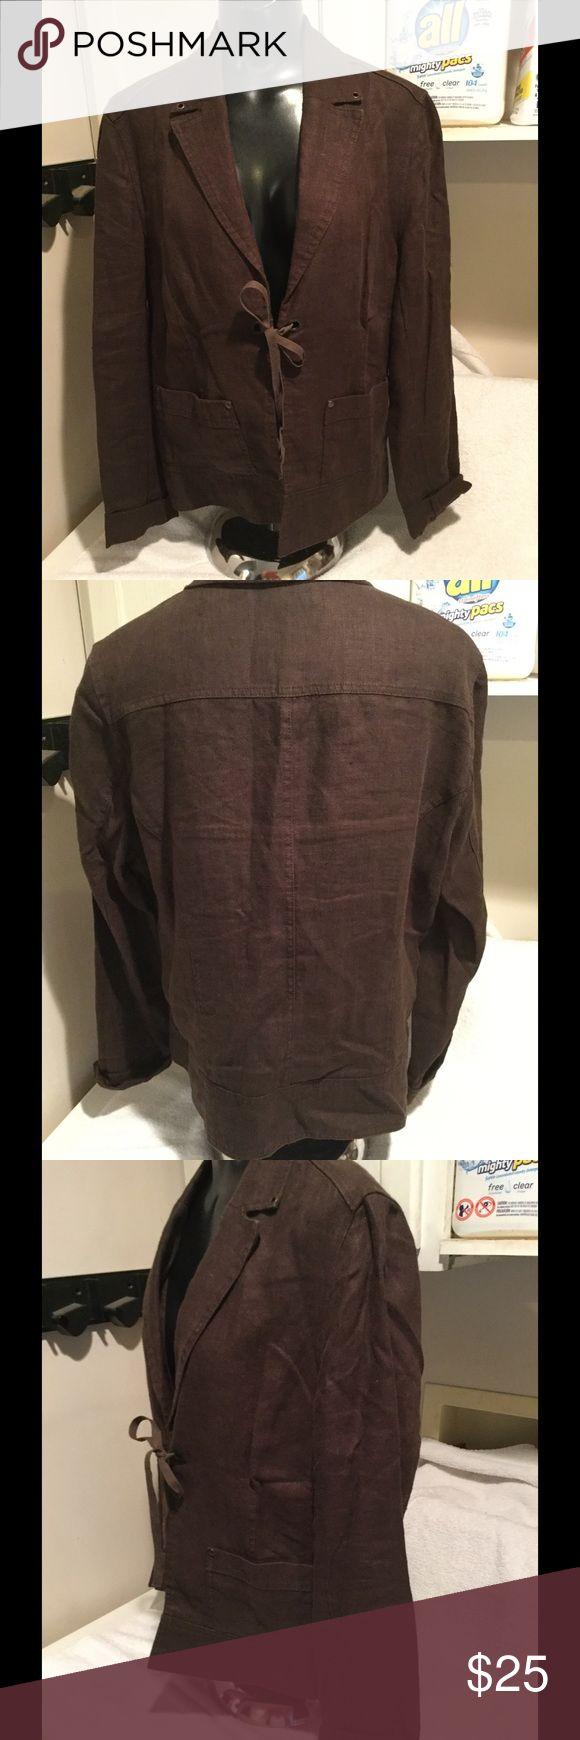 Nwot, brown dressy jacket, blazer. Nwot, gorgeous brown light weight jacket, blazer. Ties in the middle. Very unique classy looking blazer. miss etam Jackets & Coats Blazers